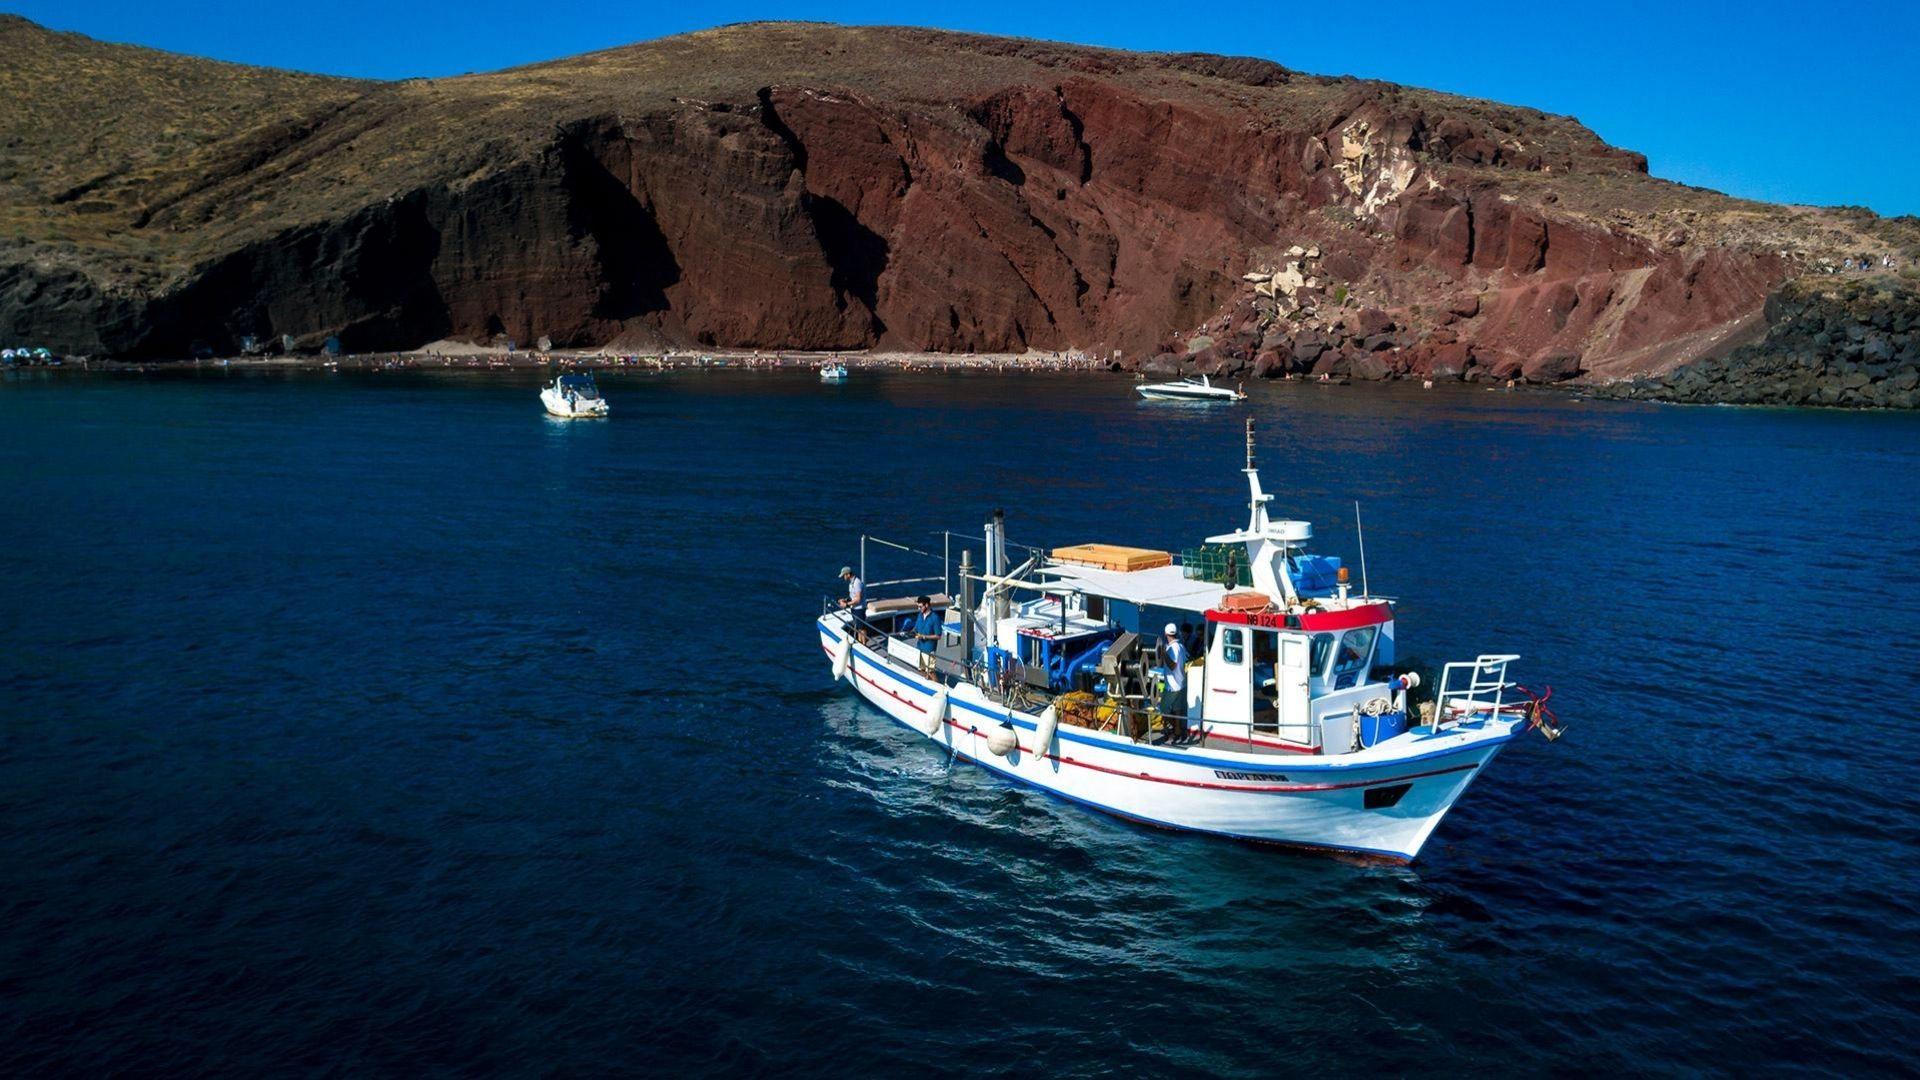 Tours in Santorini - Fishing tour